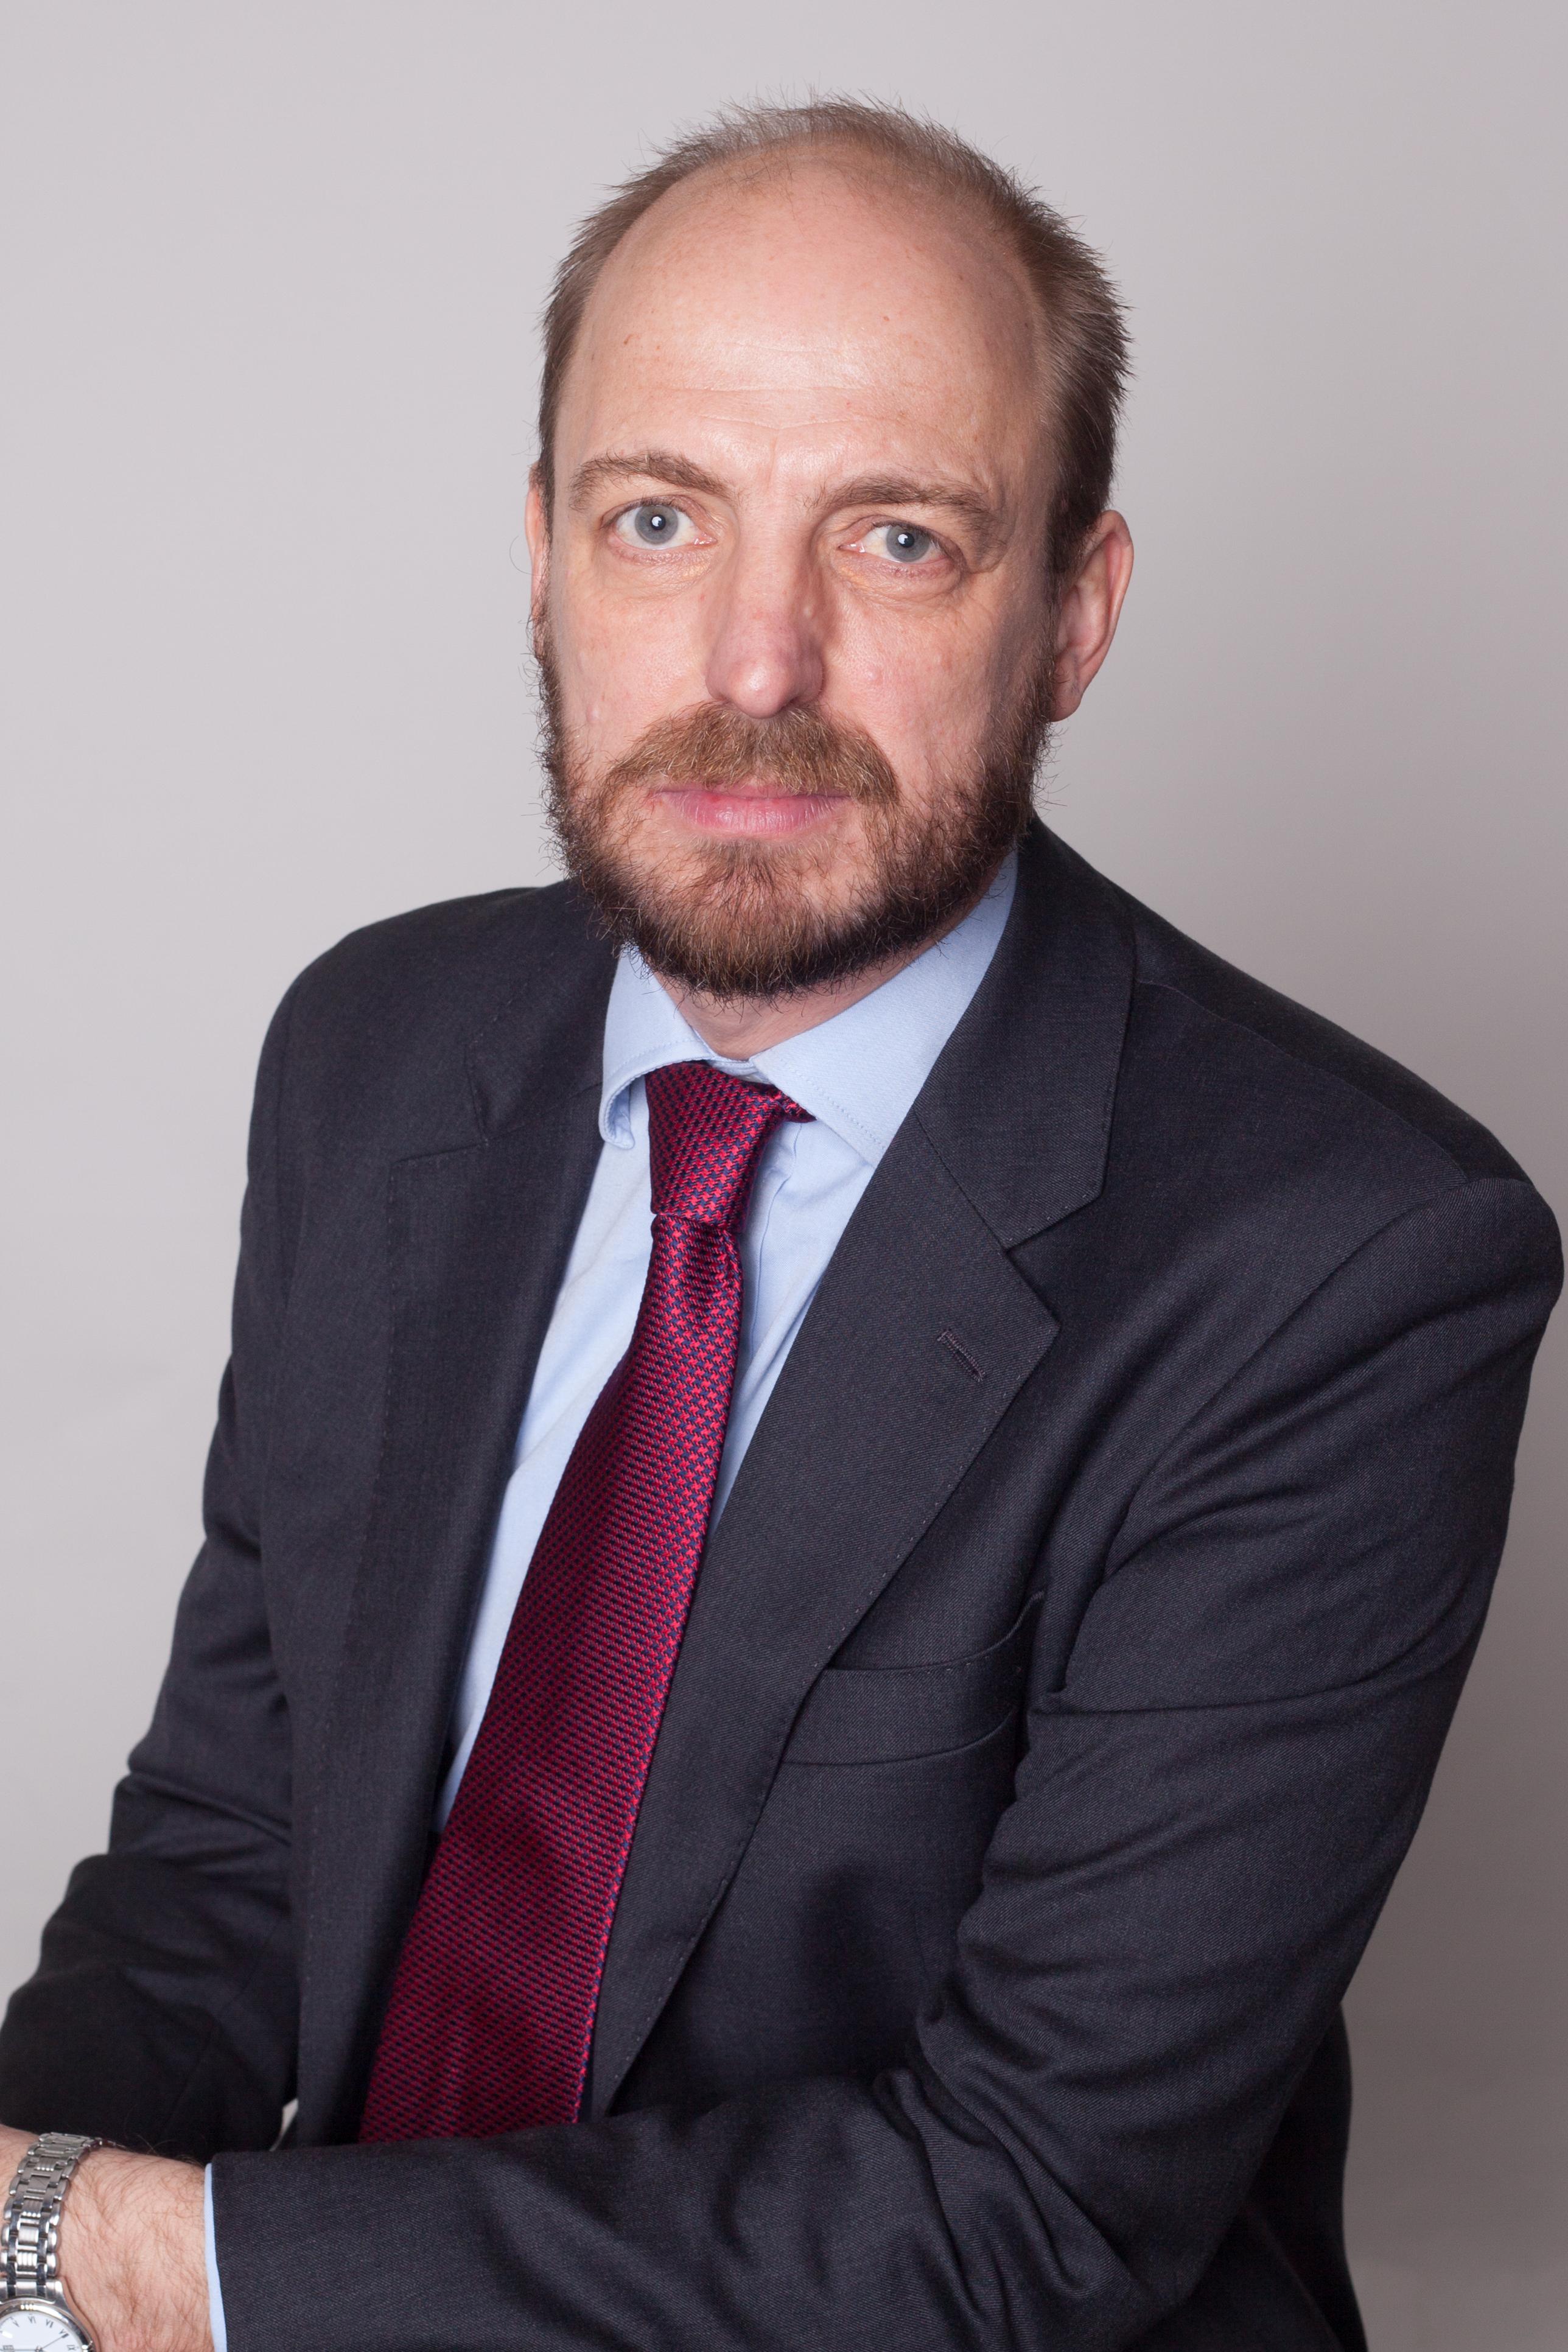 Prof. Lloyd Clark